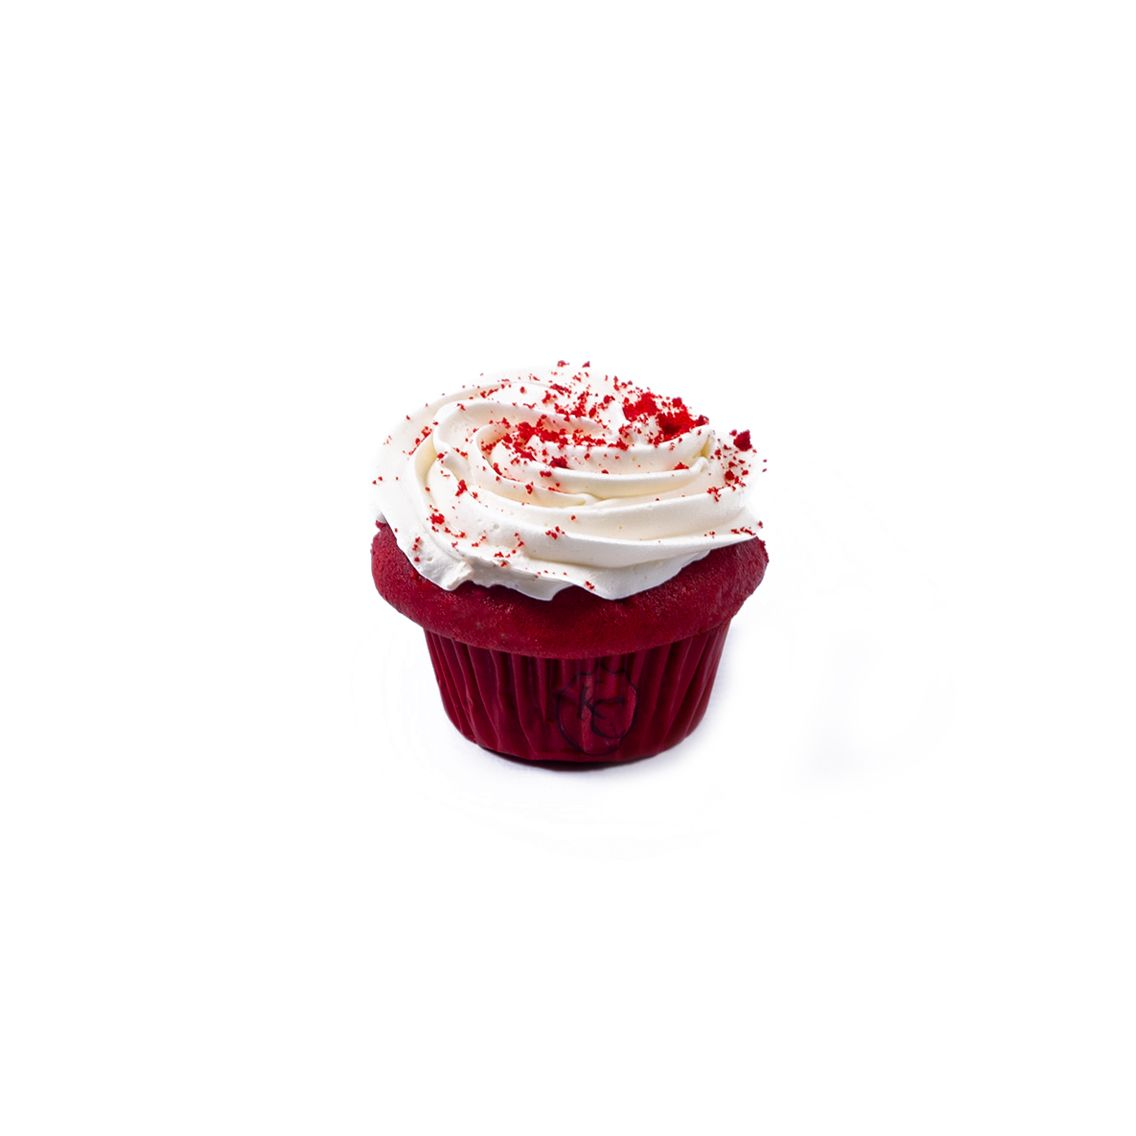 Kitchen Cuisine Default Category Red Velvet Cupcake